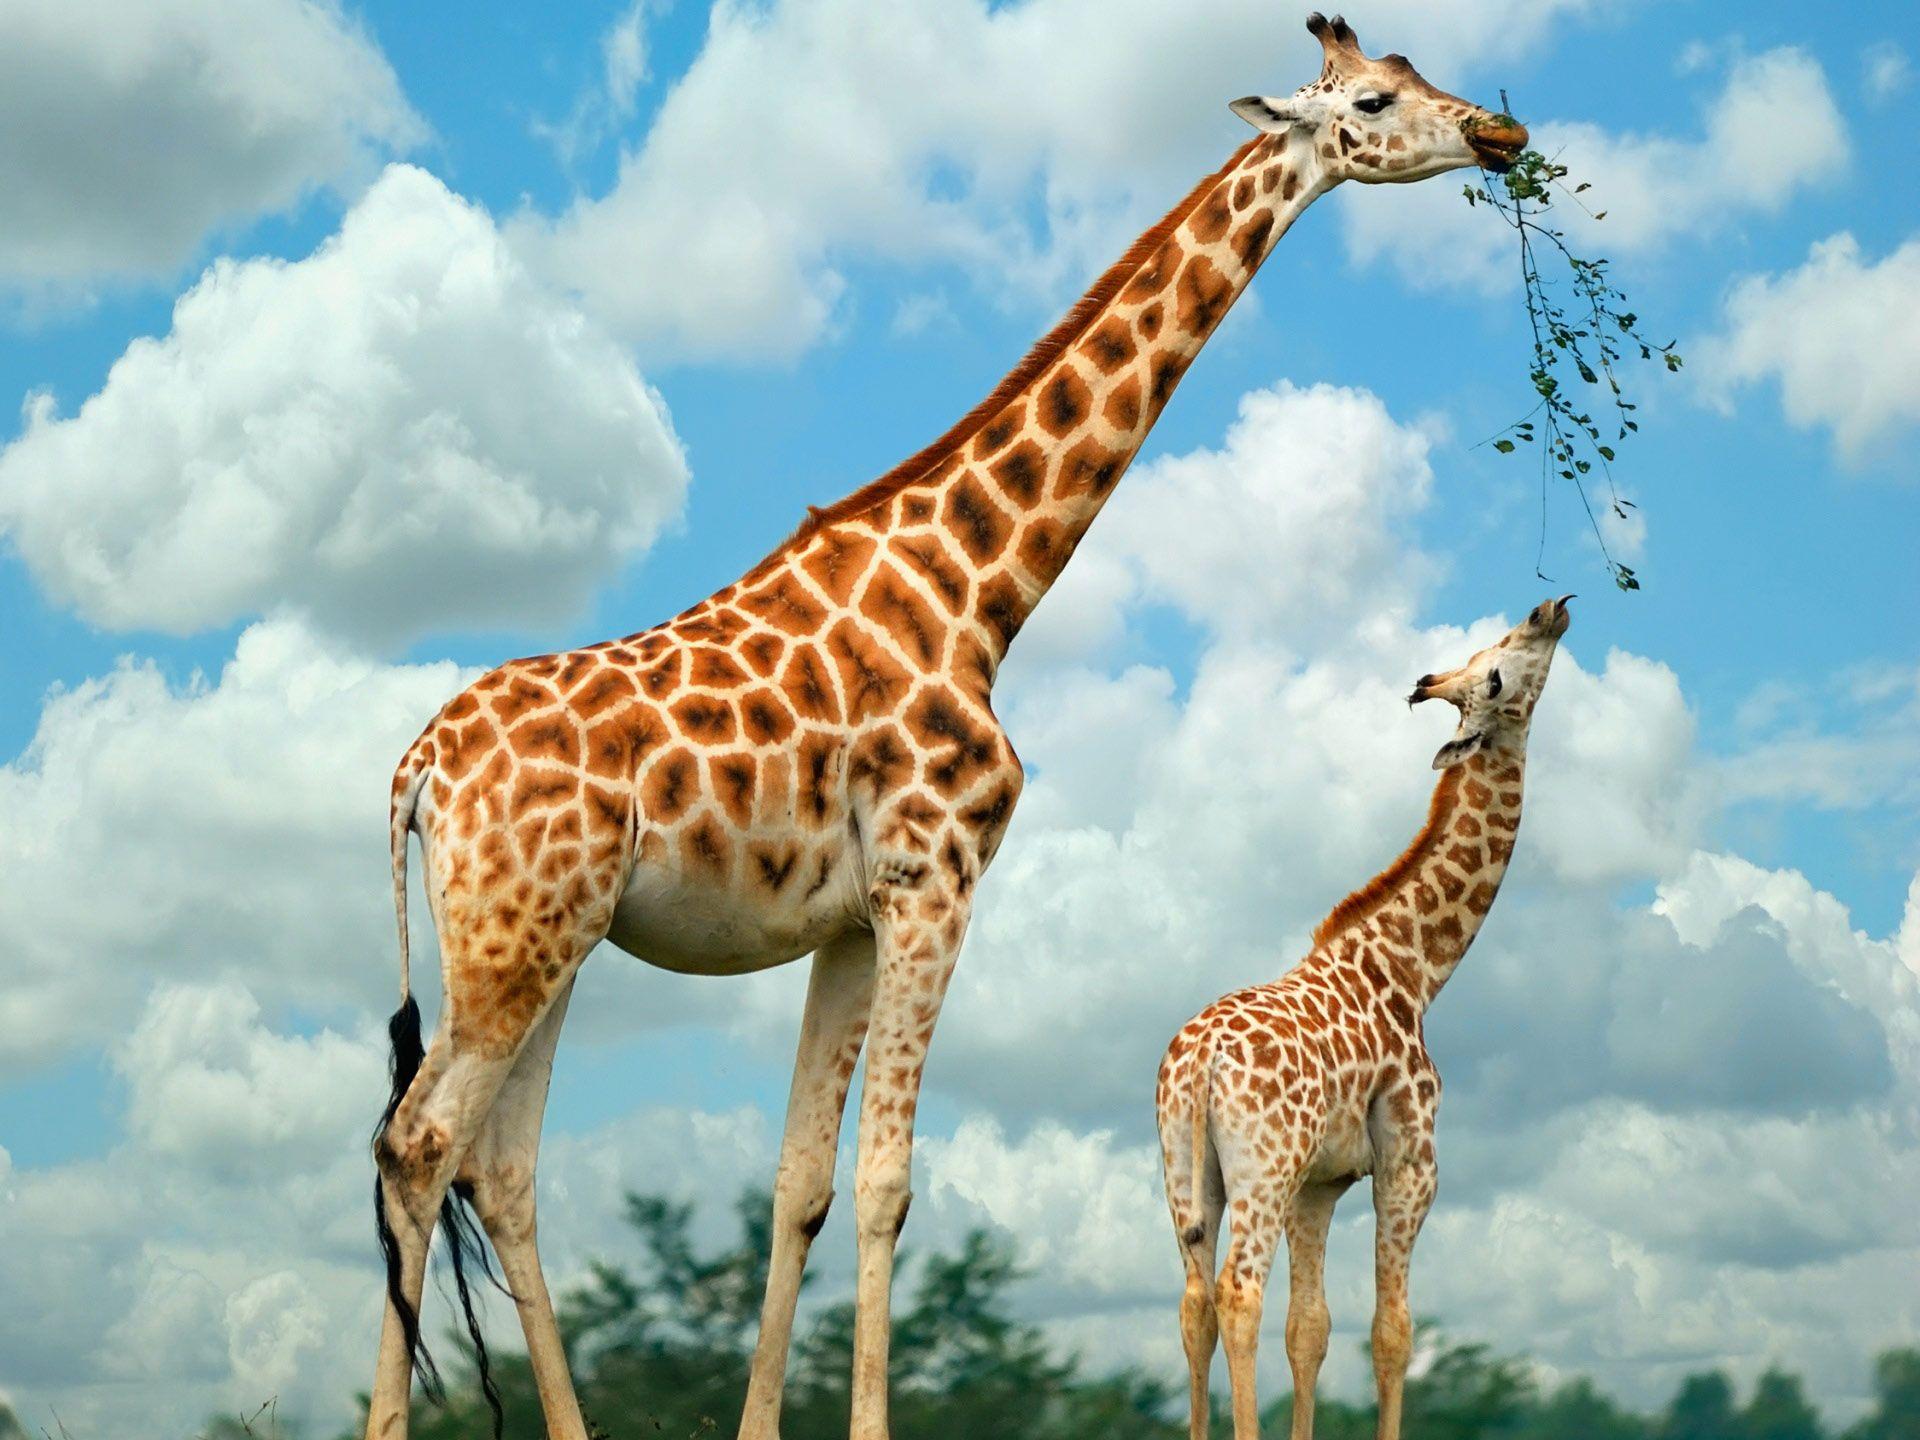 Baby Giraffe i heart giraffes Pinterest Animals Giraffe 1920x1440